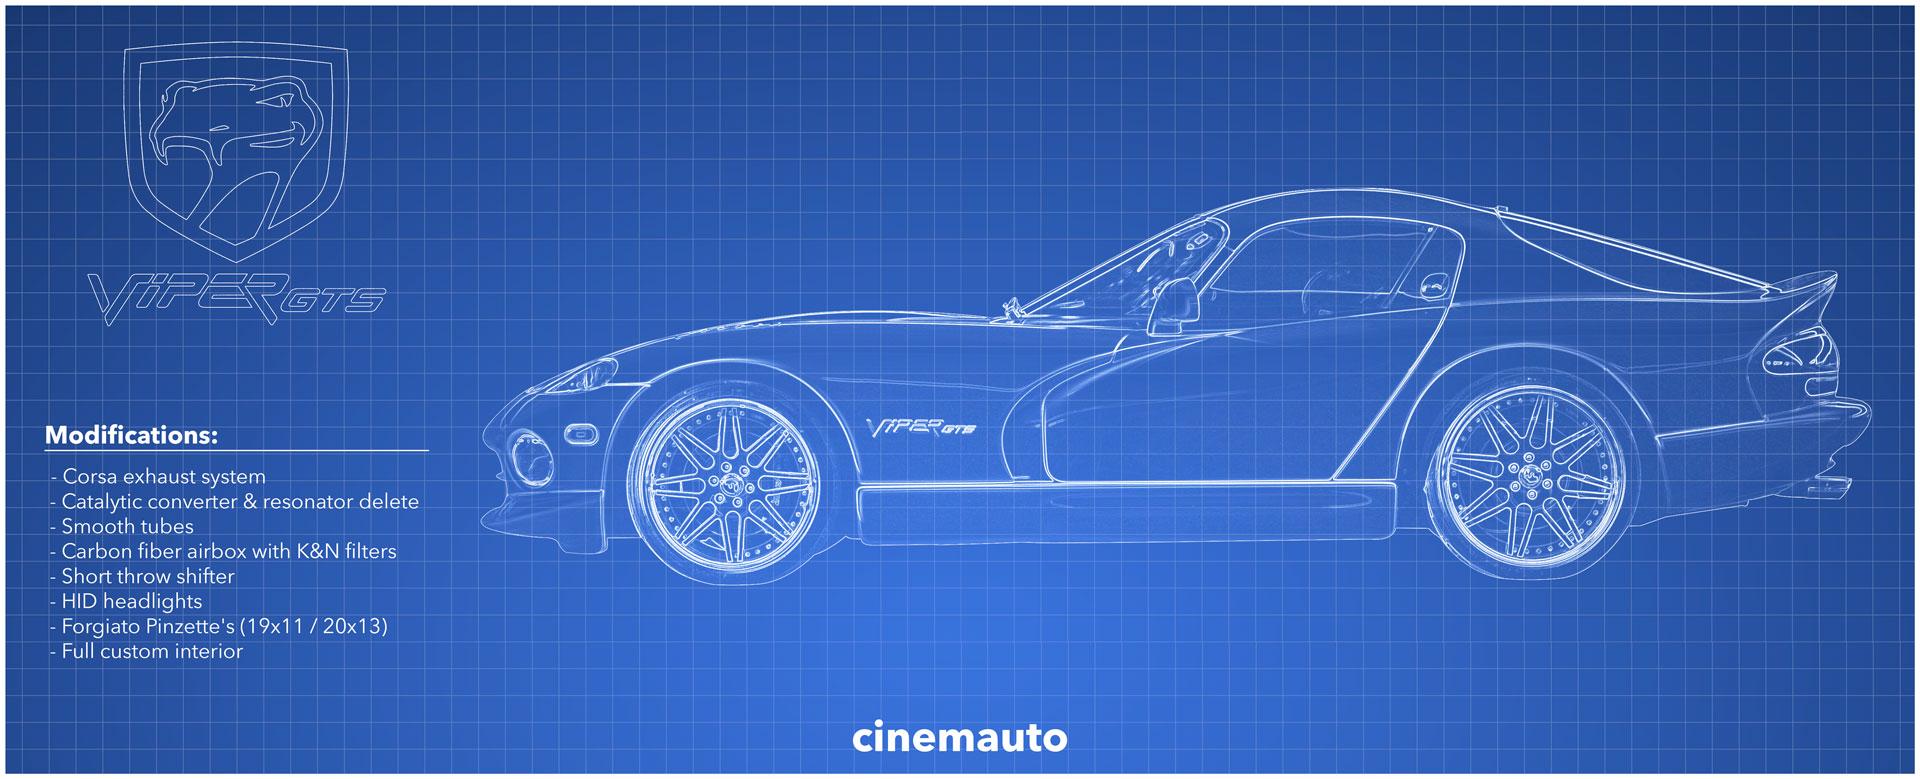 cinemauto-blueprint-ah.jpg